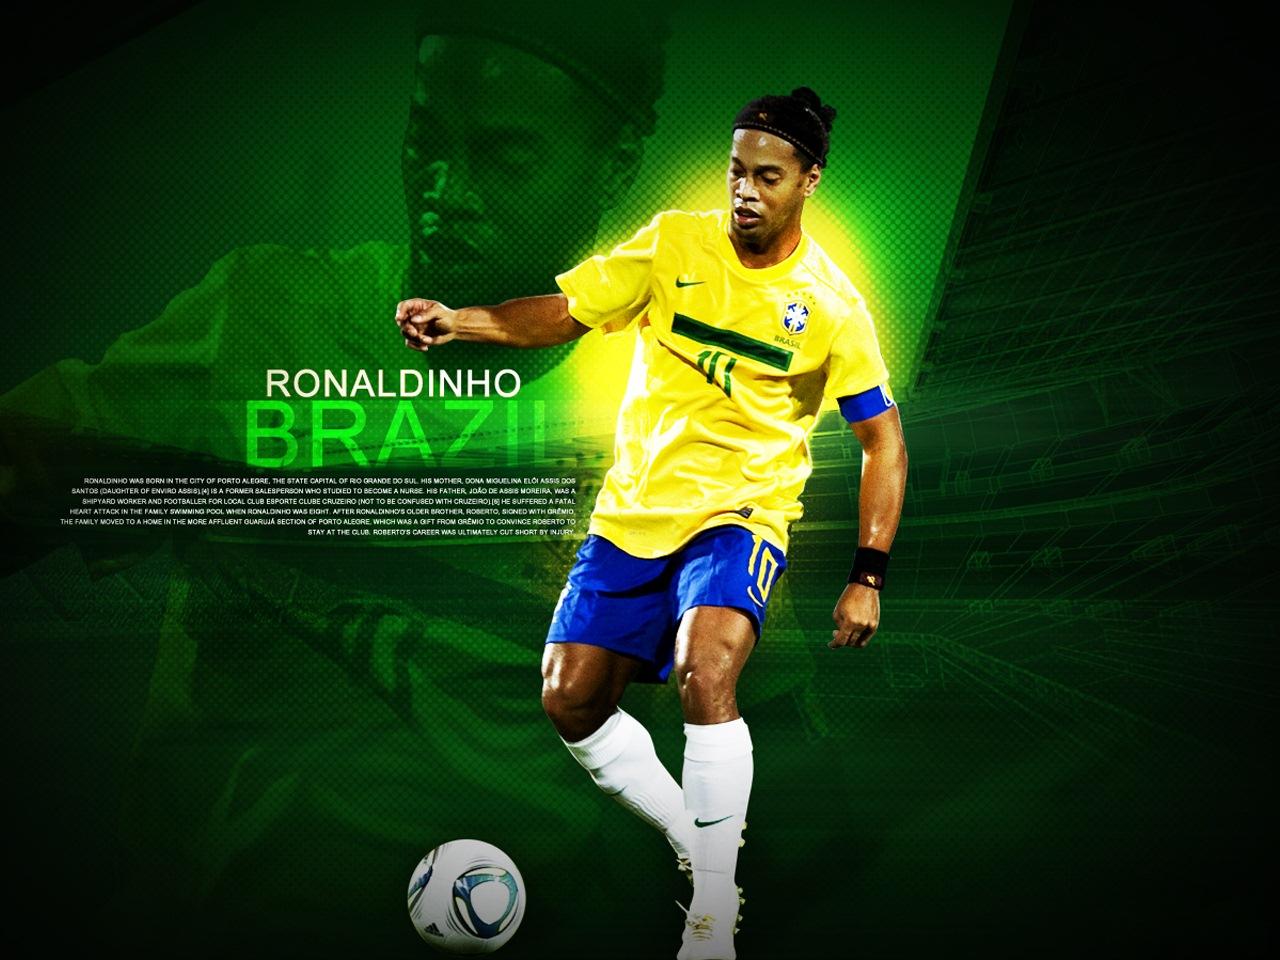 http://2.bp.blogspot.com/-gdBOzRM96_o/T_j5LKqP9iI/AAAAAAAAAP4/3MFWy9_yaag/s1600/Ronaldinho-Brazil-Wallpaper.jpg